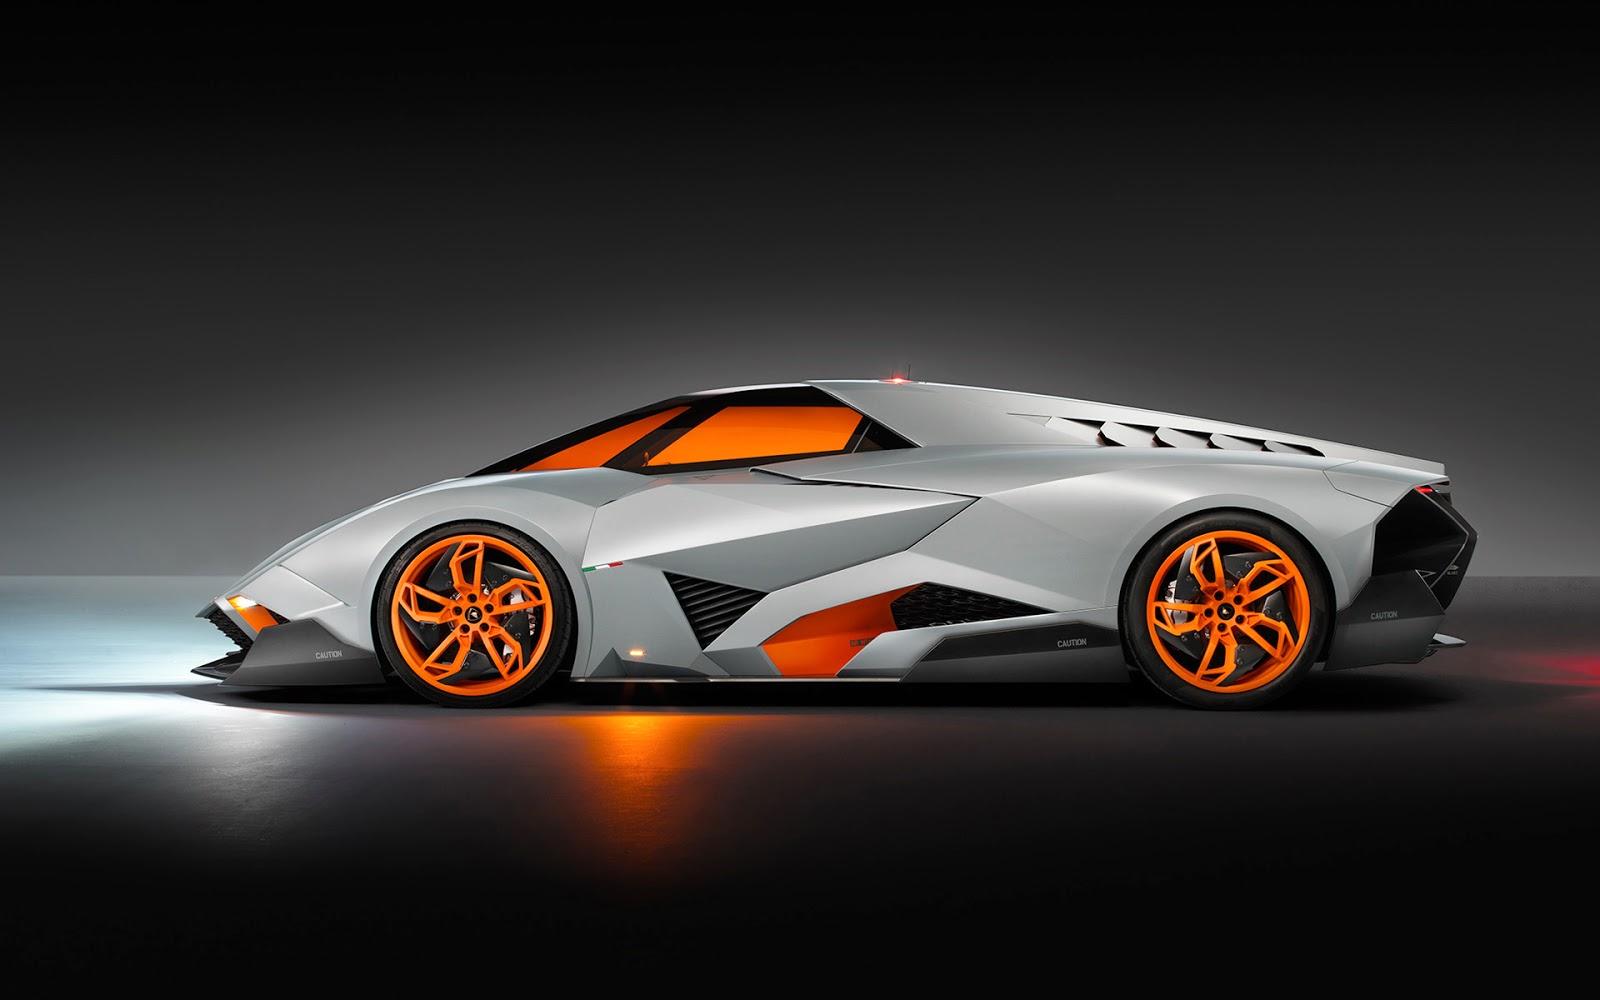 cars bugatti cars desktop wallpapers honda cars wallpapers 3d 1600x1000